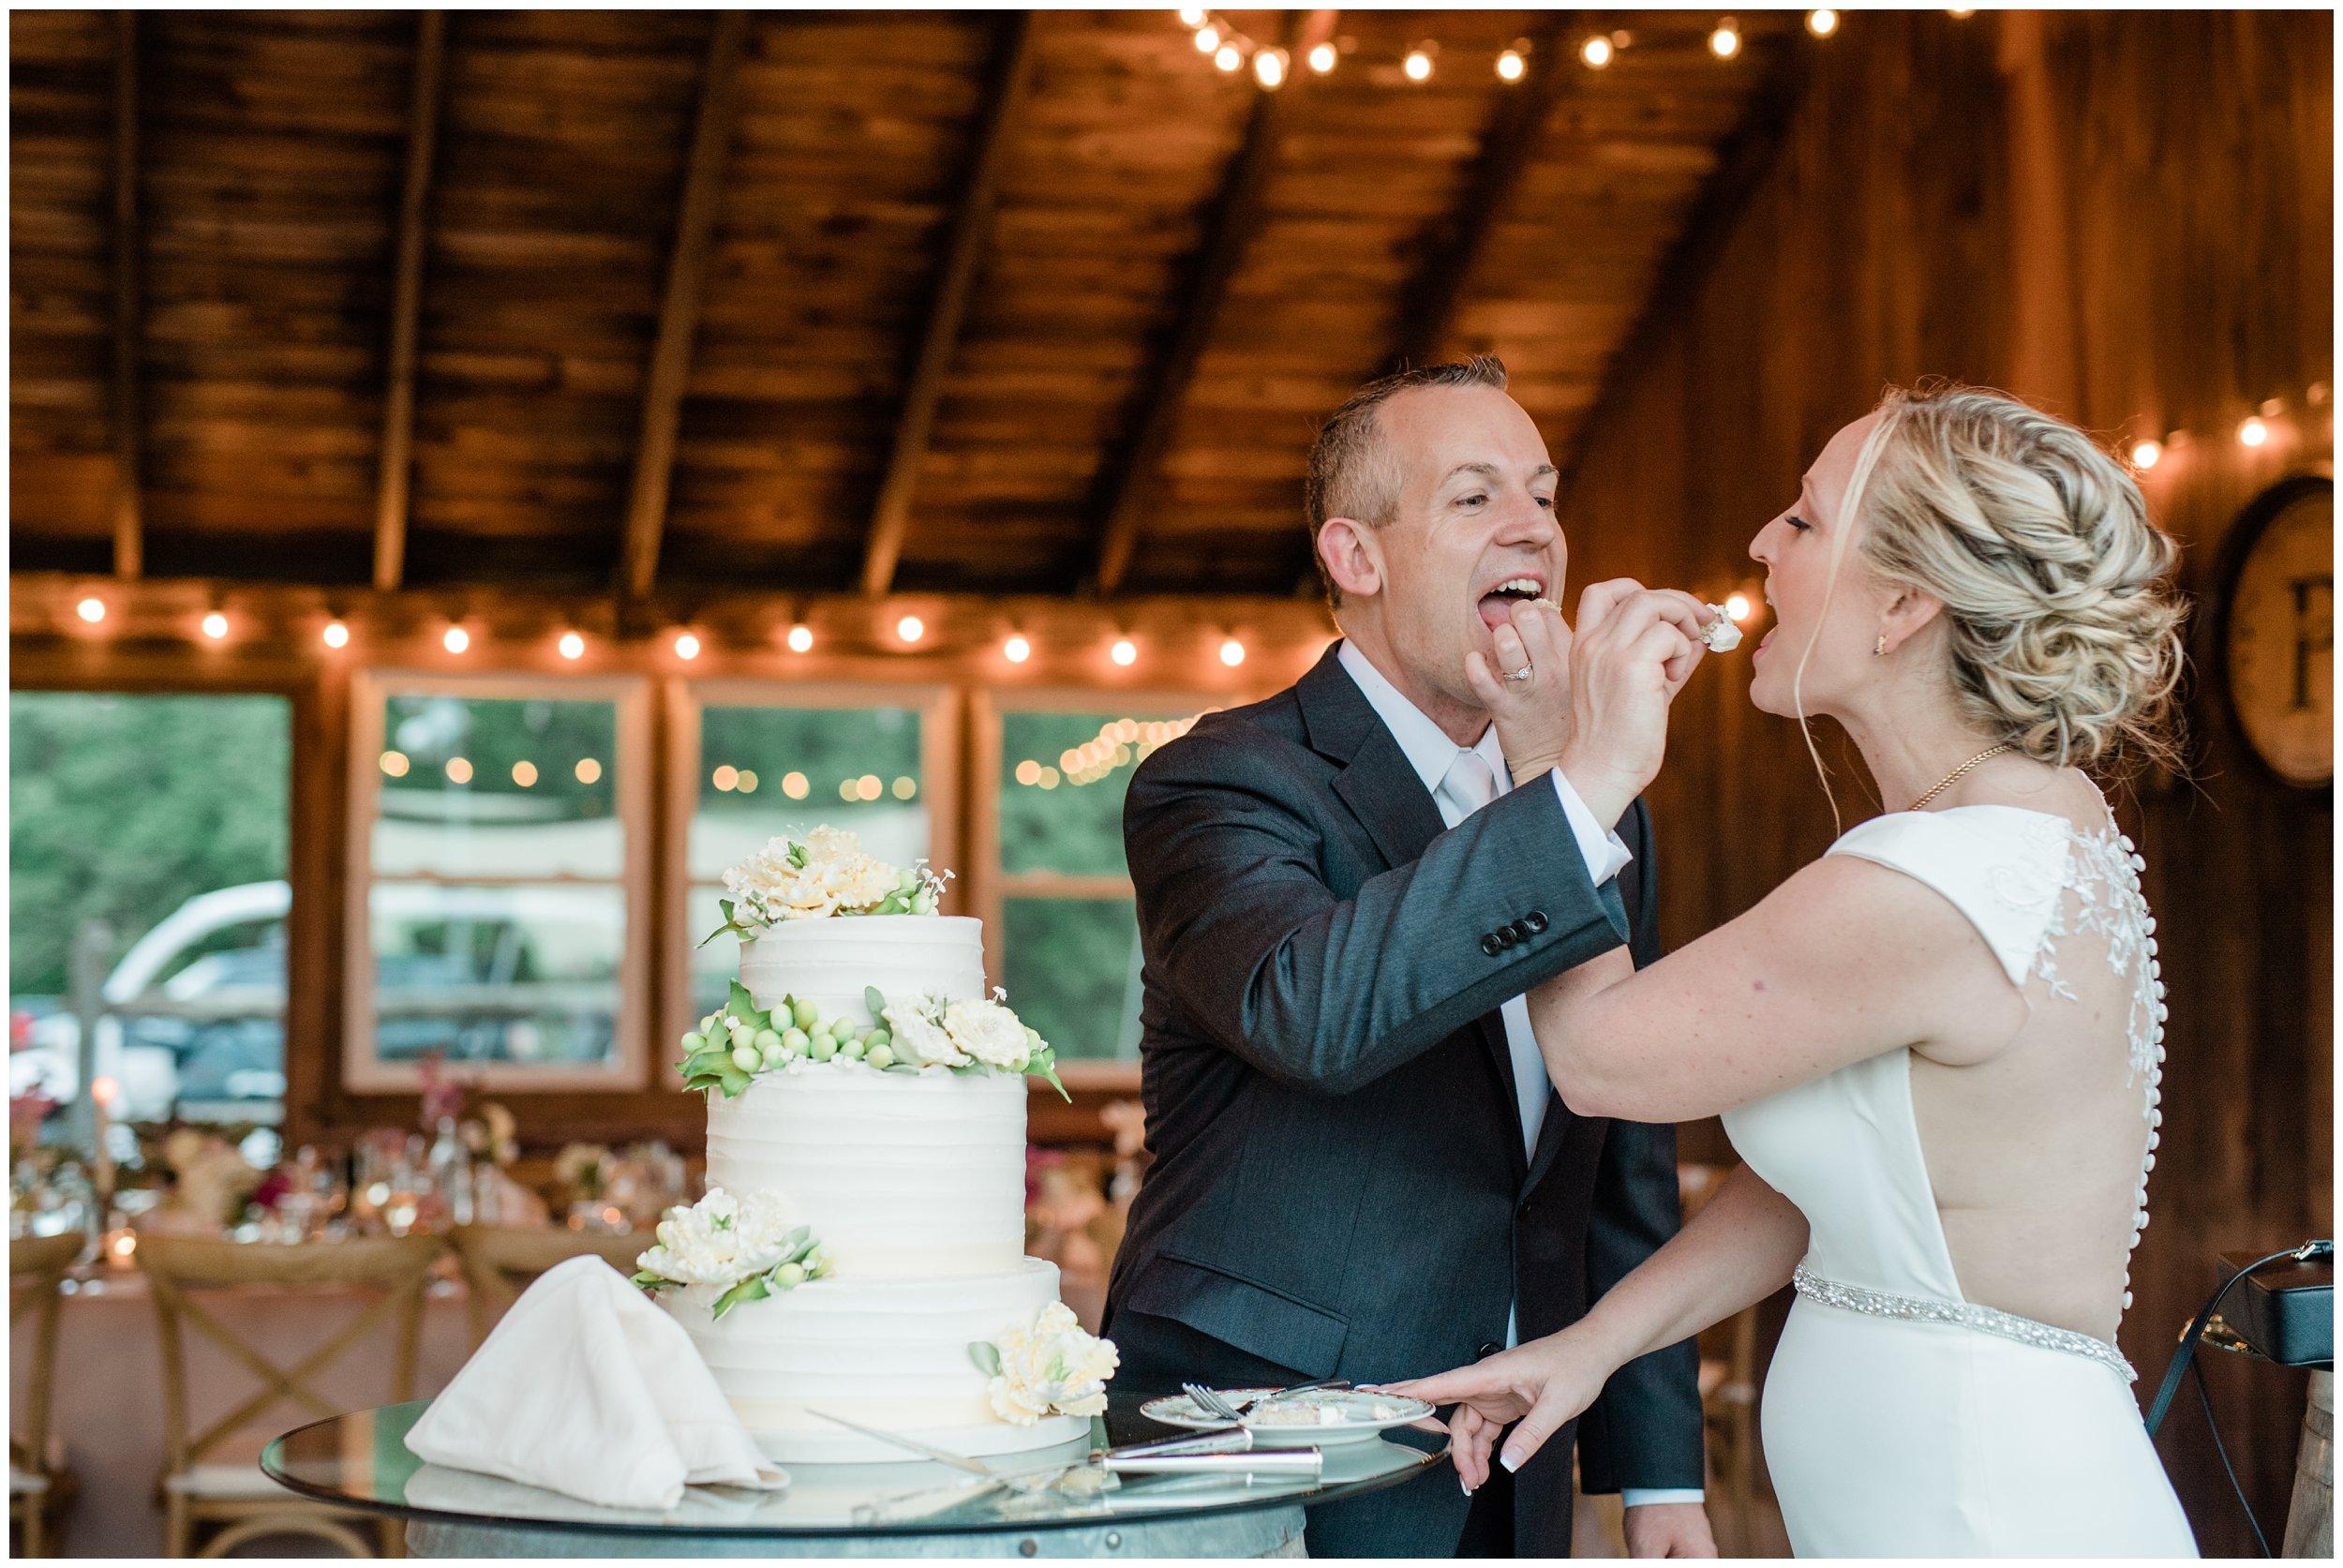 cute newlyweds cutting cake and feeding each other